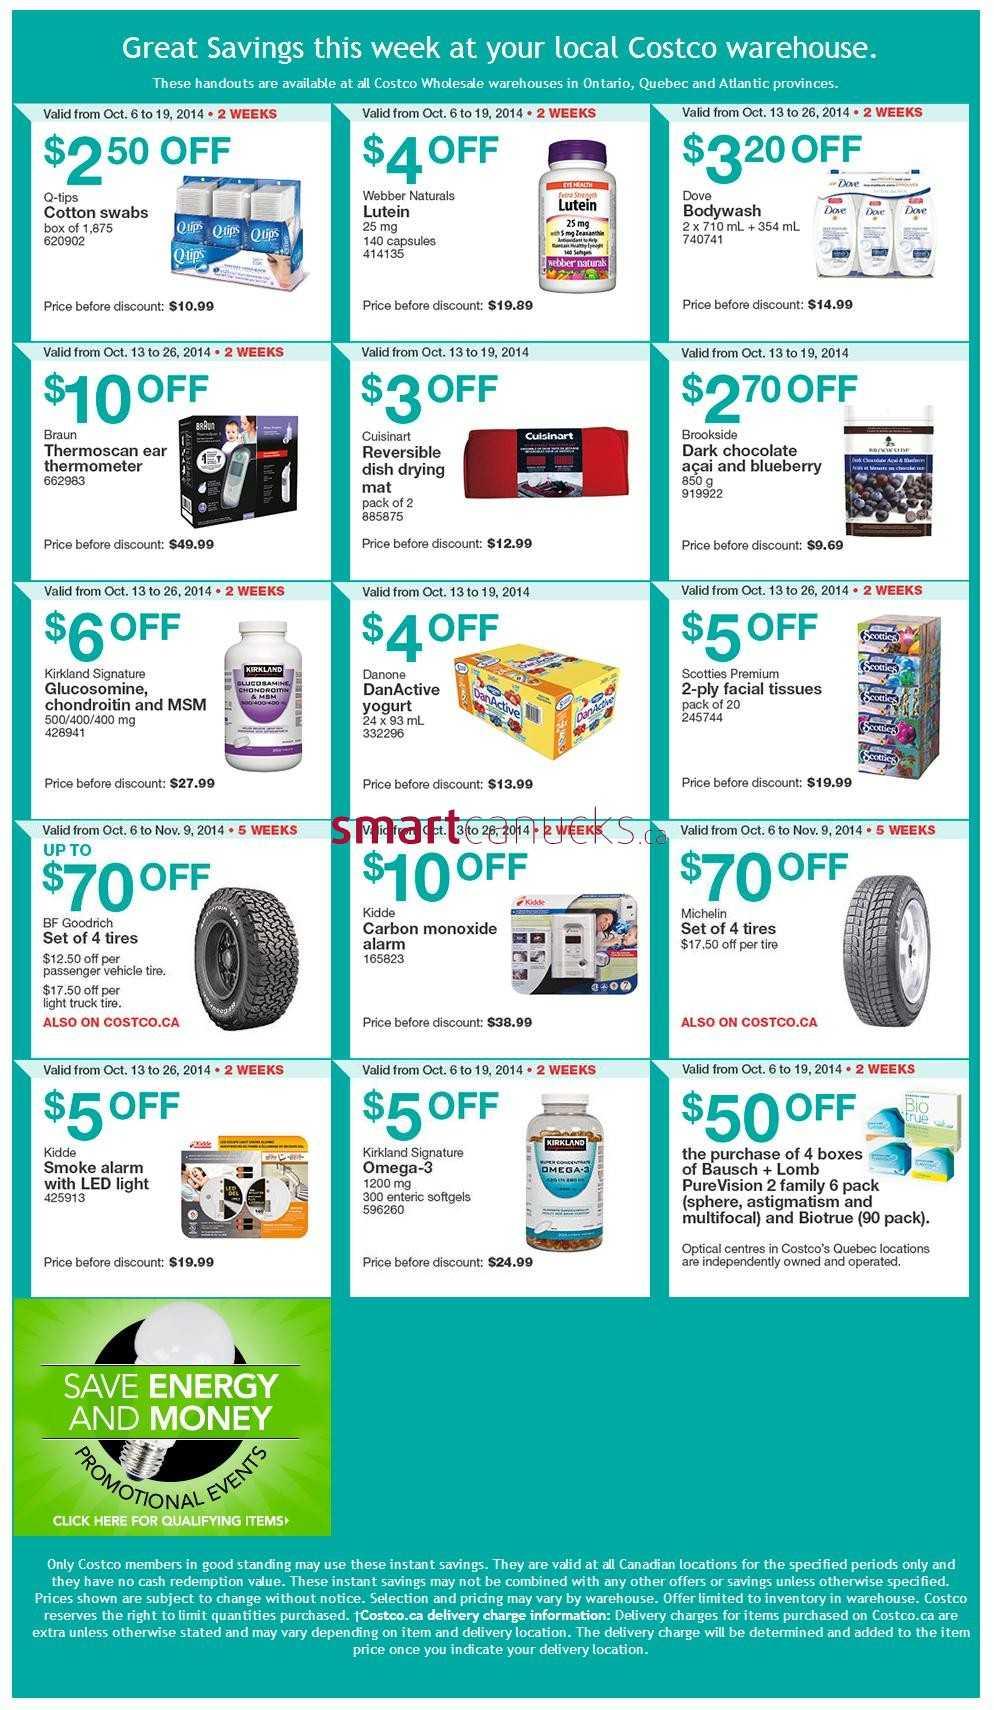 Costco Weekly Savings October 13 to 19